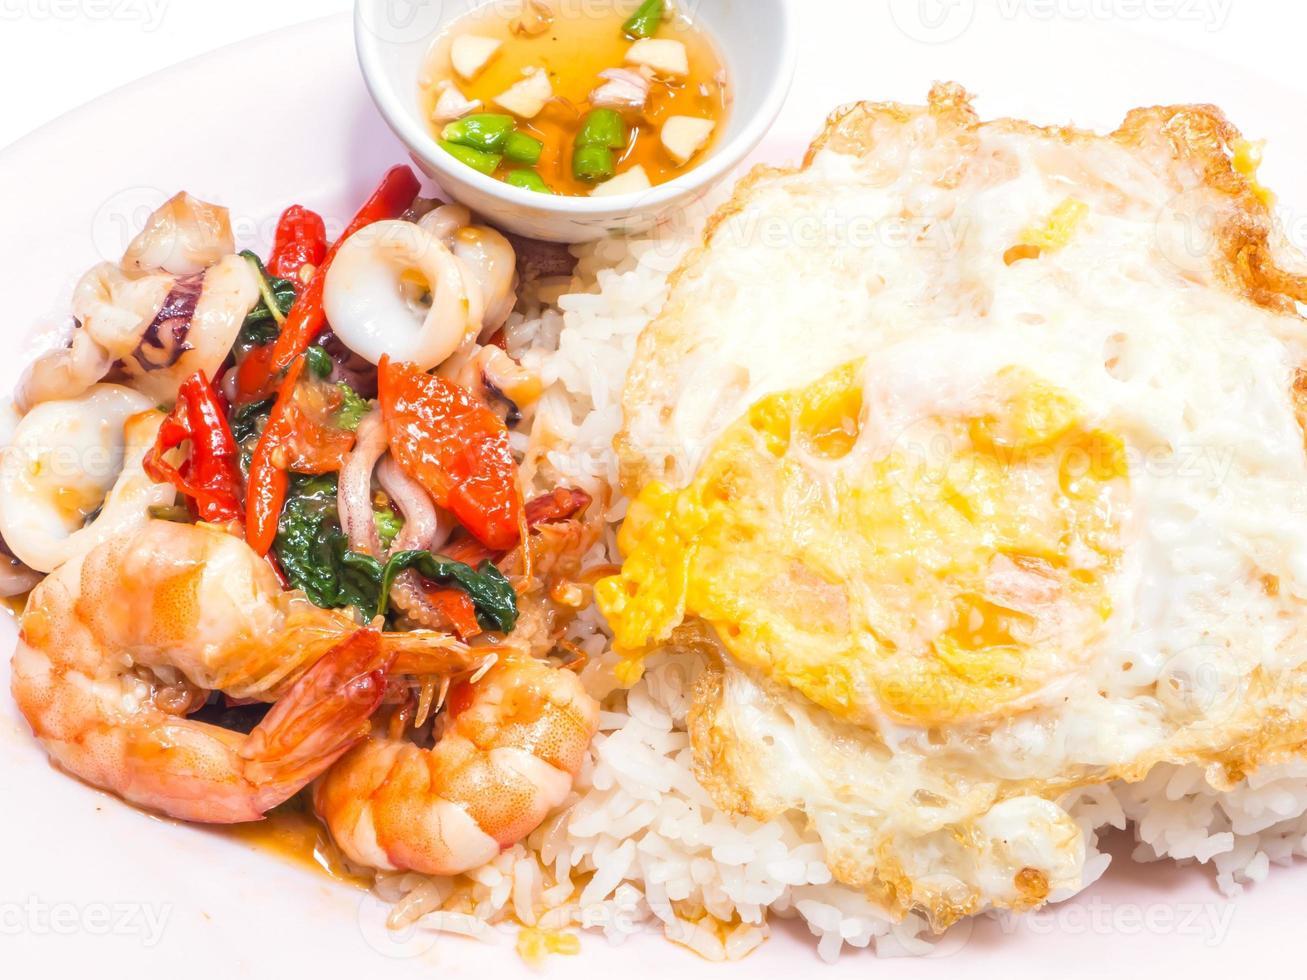 cuisine thaïlandaise épicée, sice au curry photo